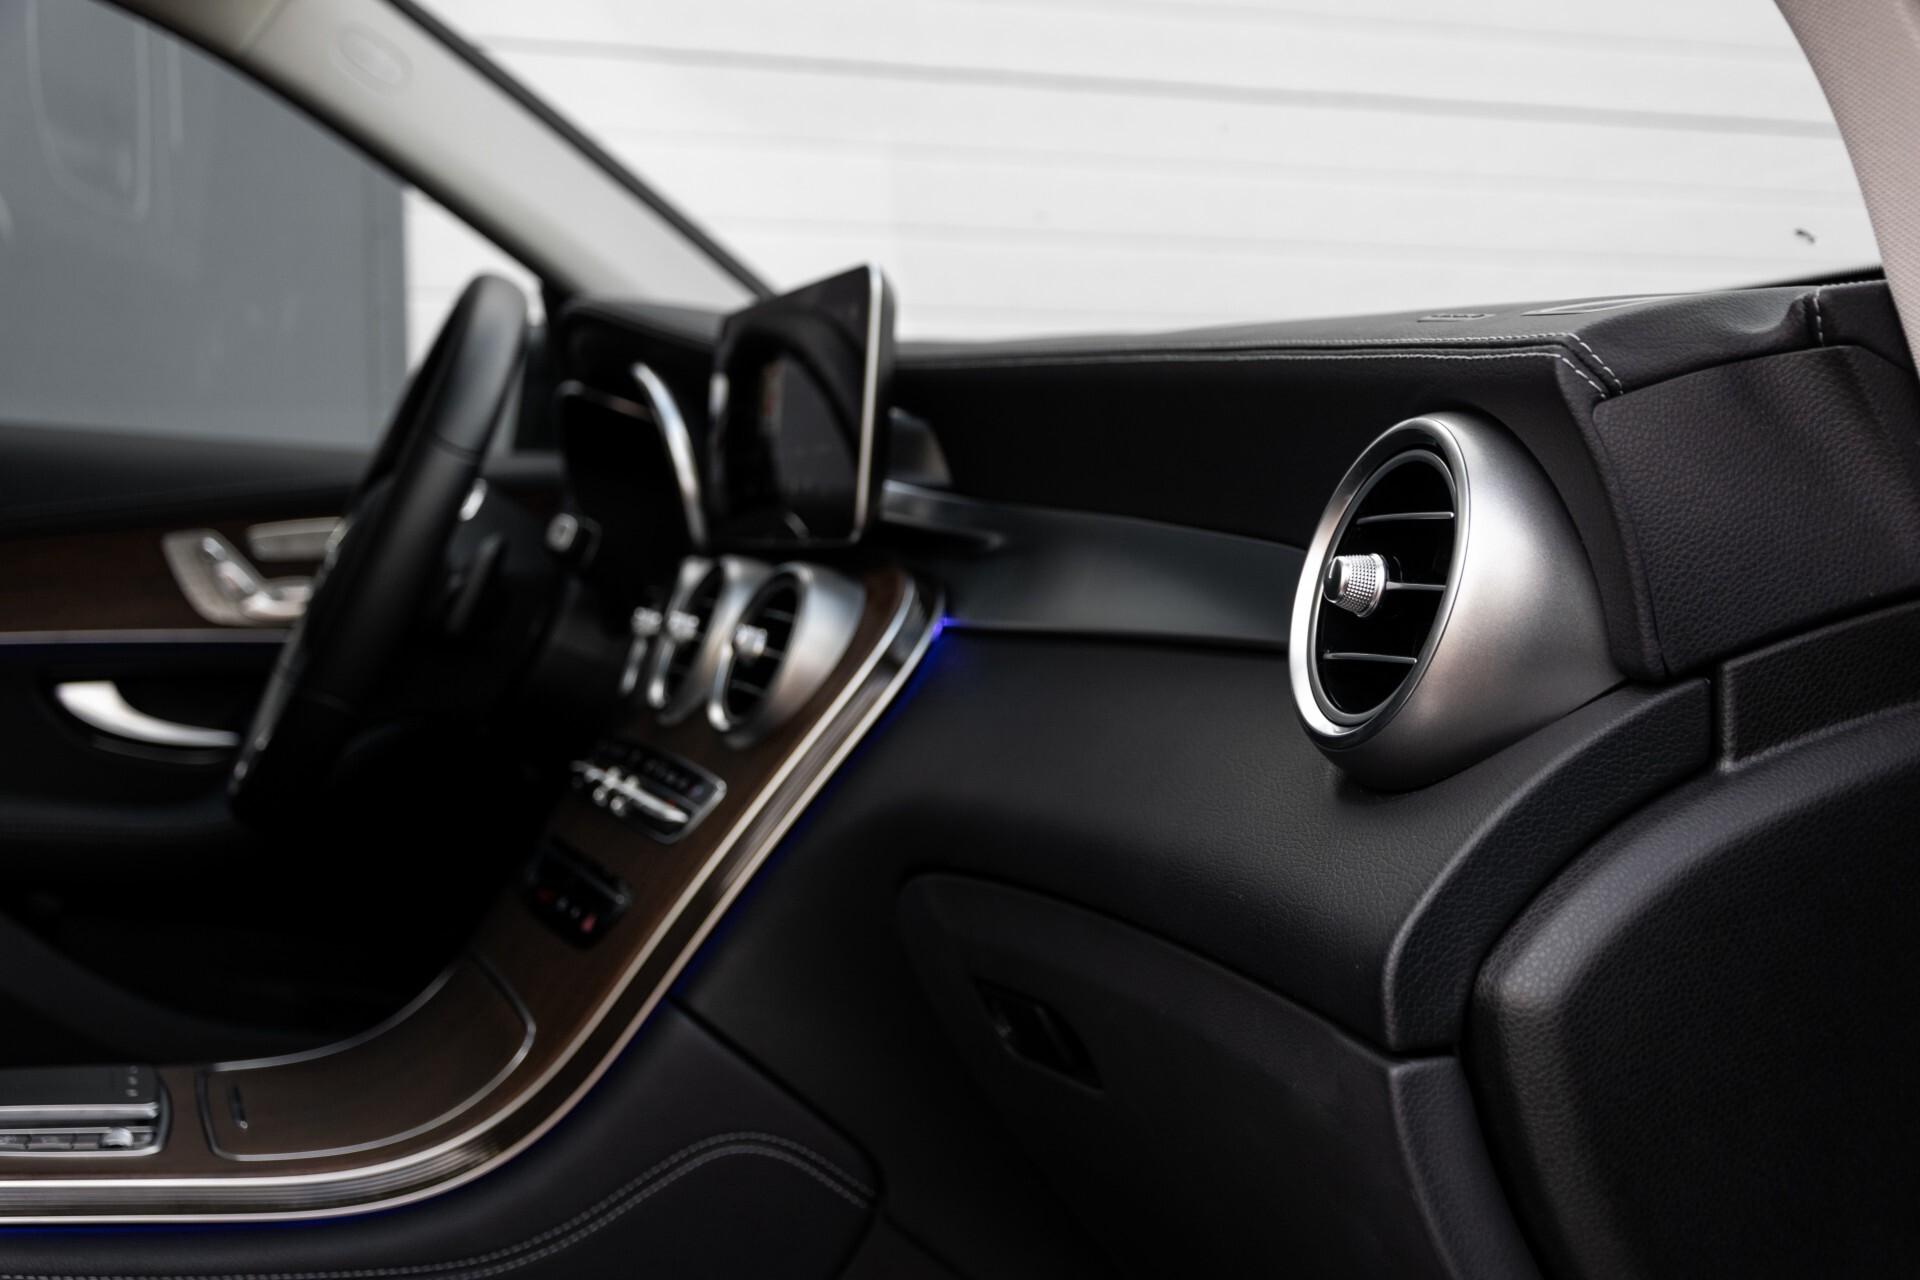 Mercedes-Benz GLC 300e 4-M Luchtvering/Panorama/Multicontourstoelen/Rij-assistentie/Standkachel Aut9 Foto 53